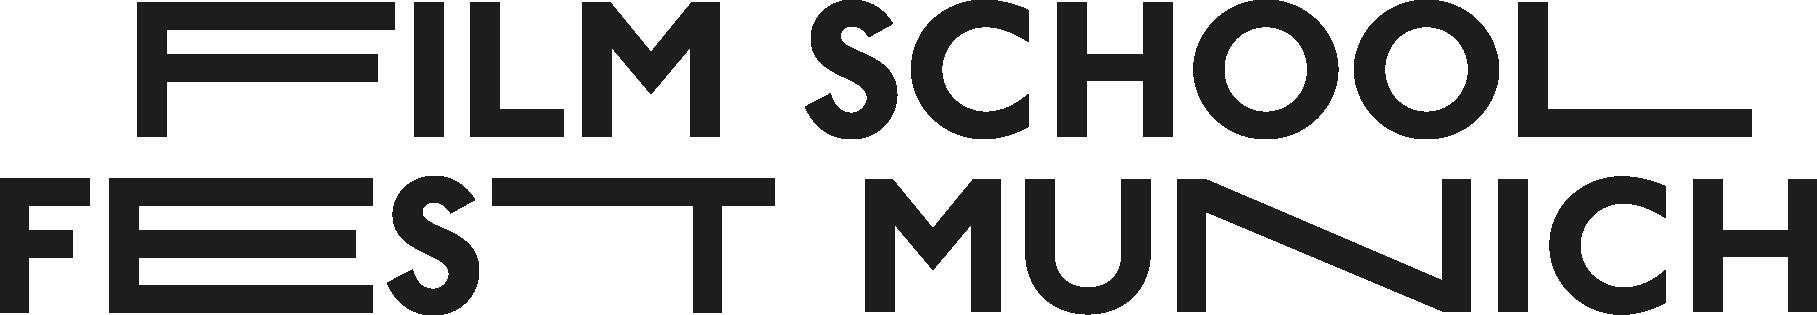 Film School Festival Munich